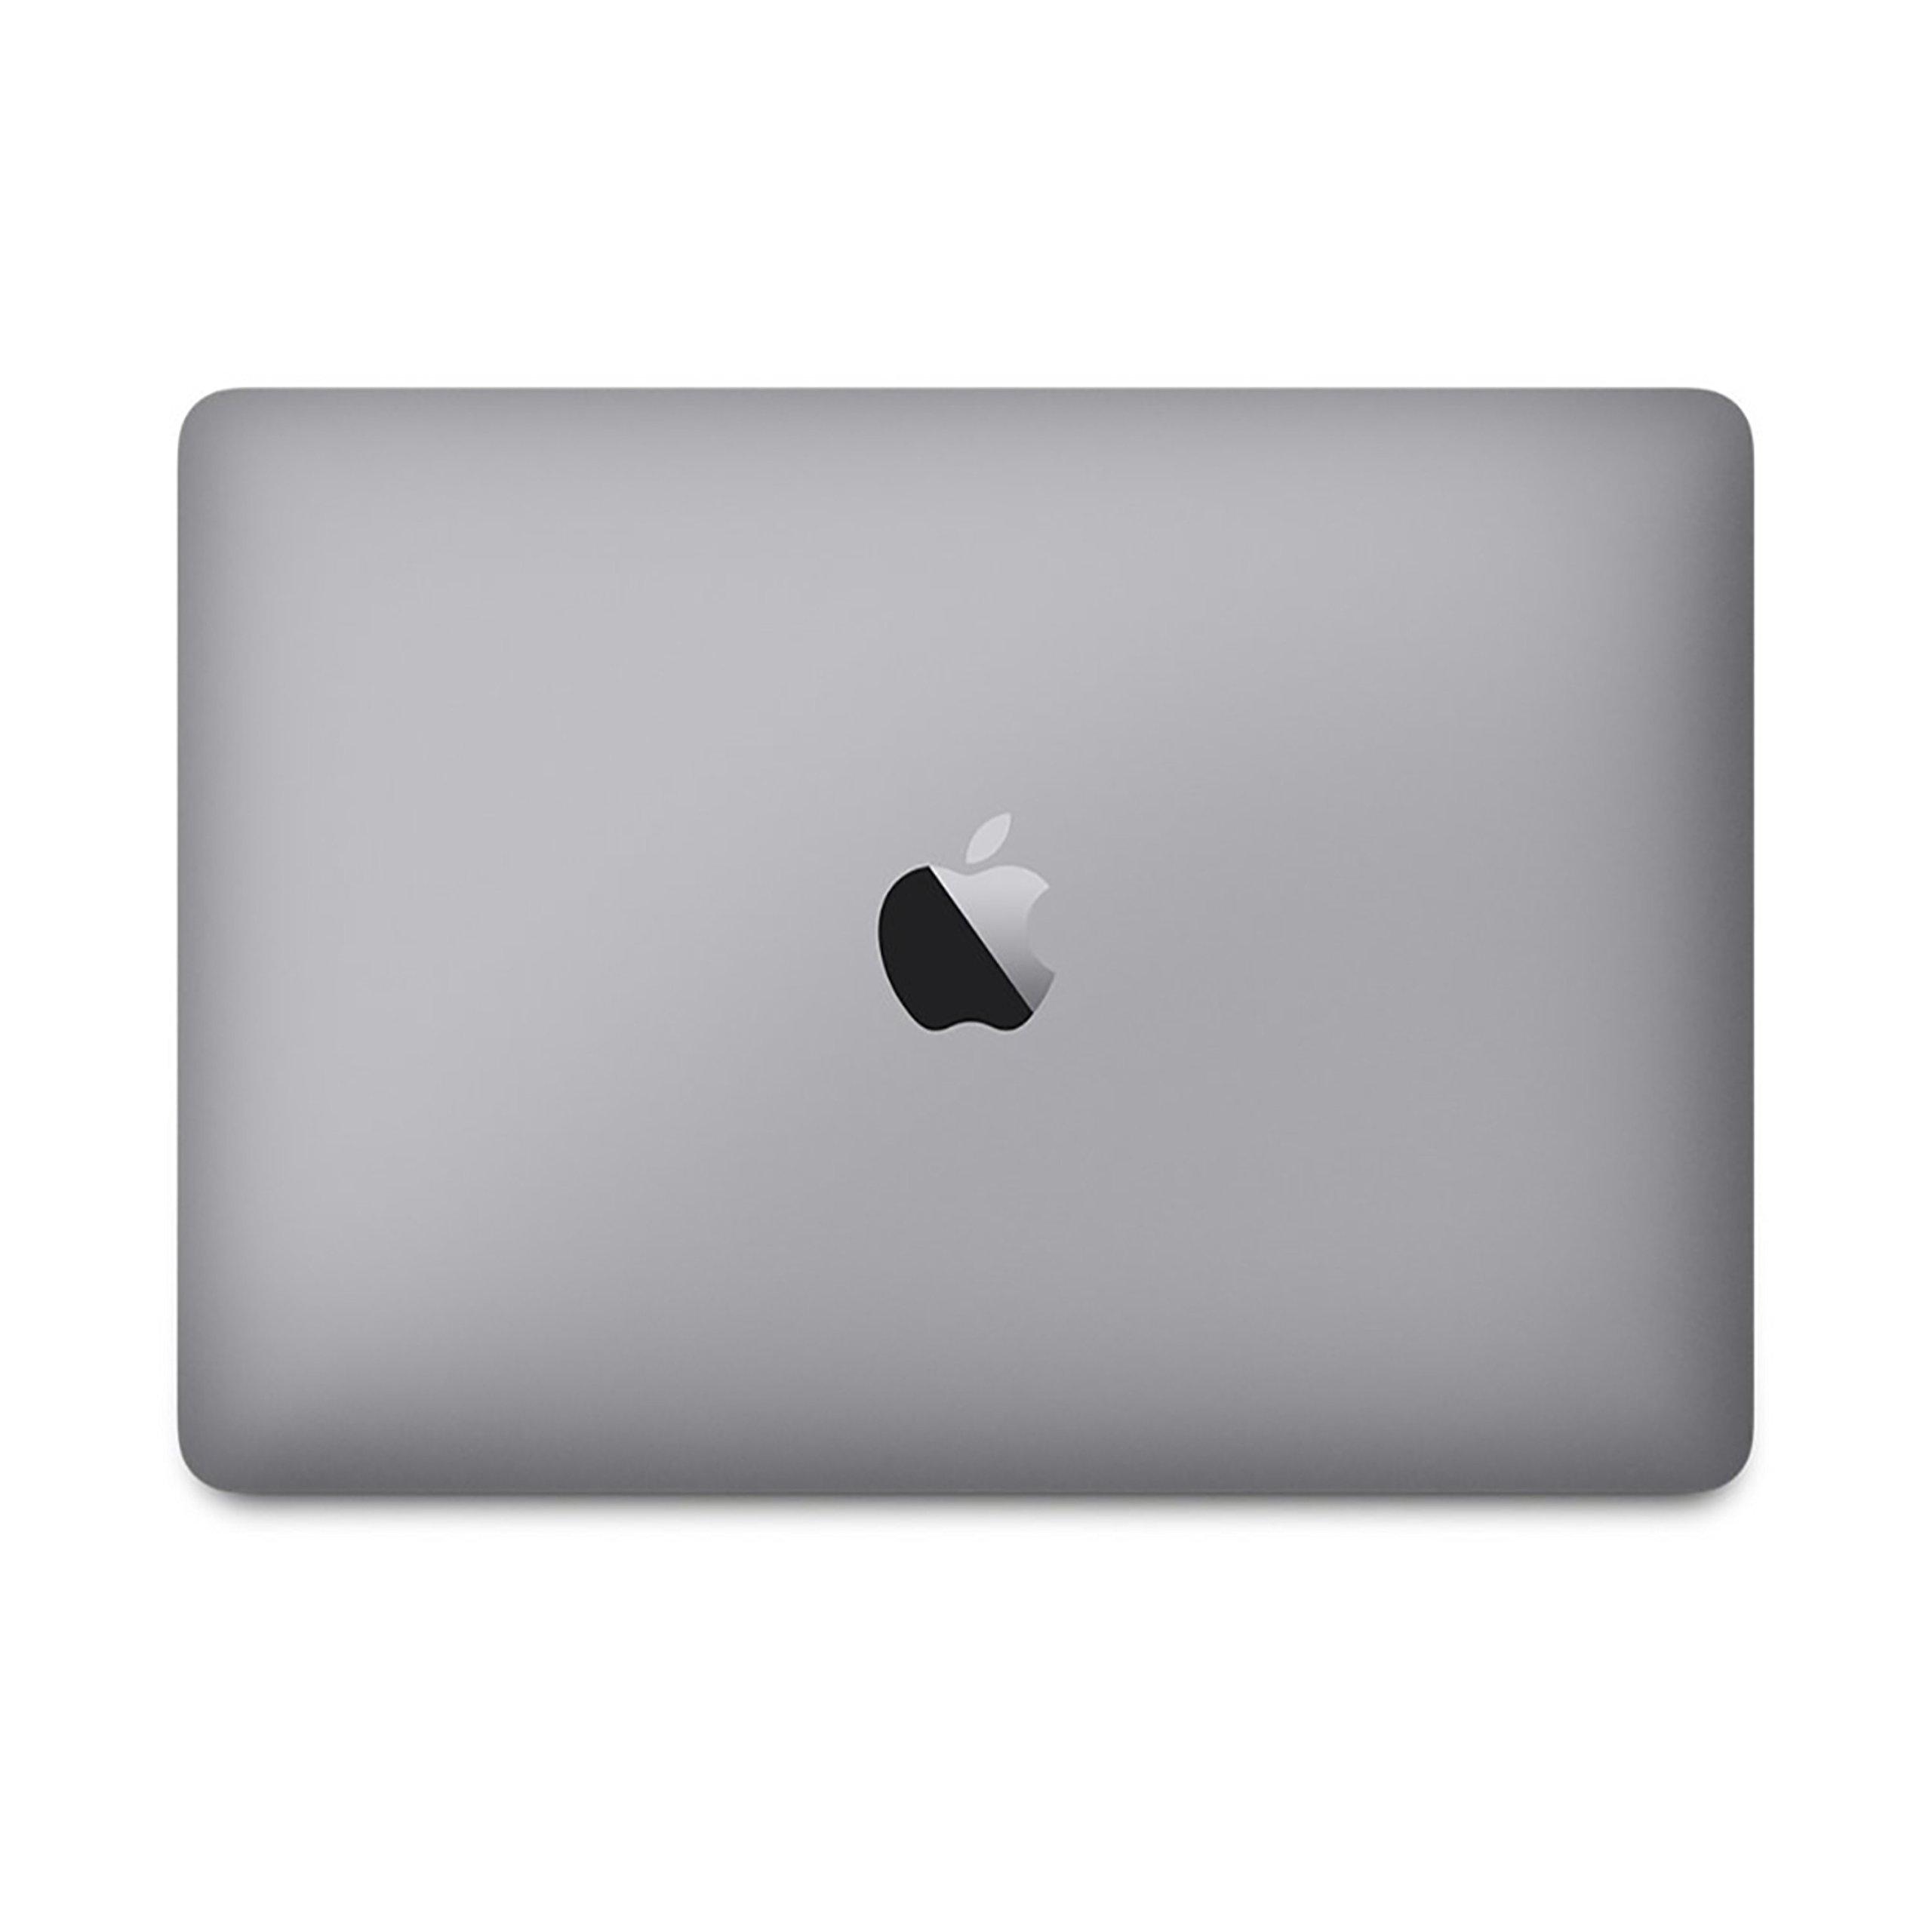 Apple Macbook Retina Display 12 Inch Core M-5Y31 1.1GHz 8GB RAM 256GB SSD (Certified Refurbished)